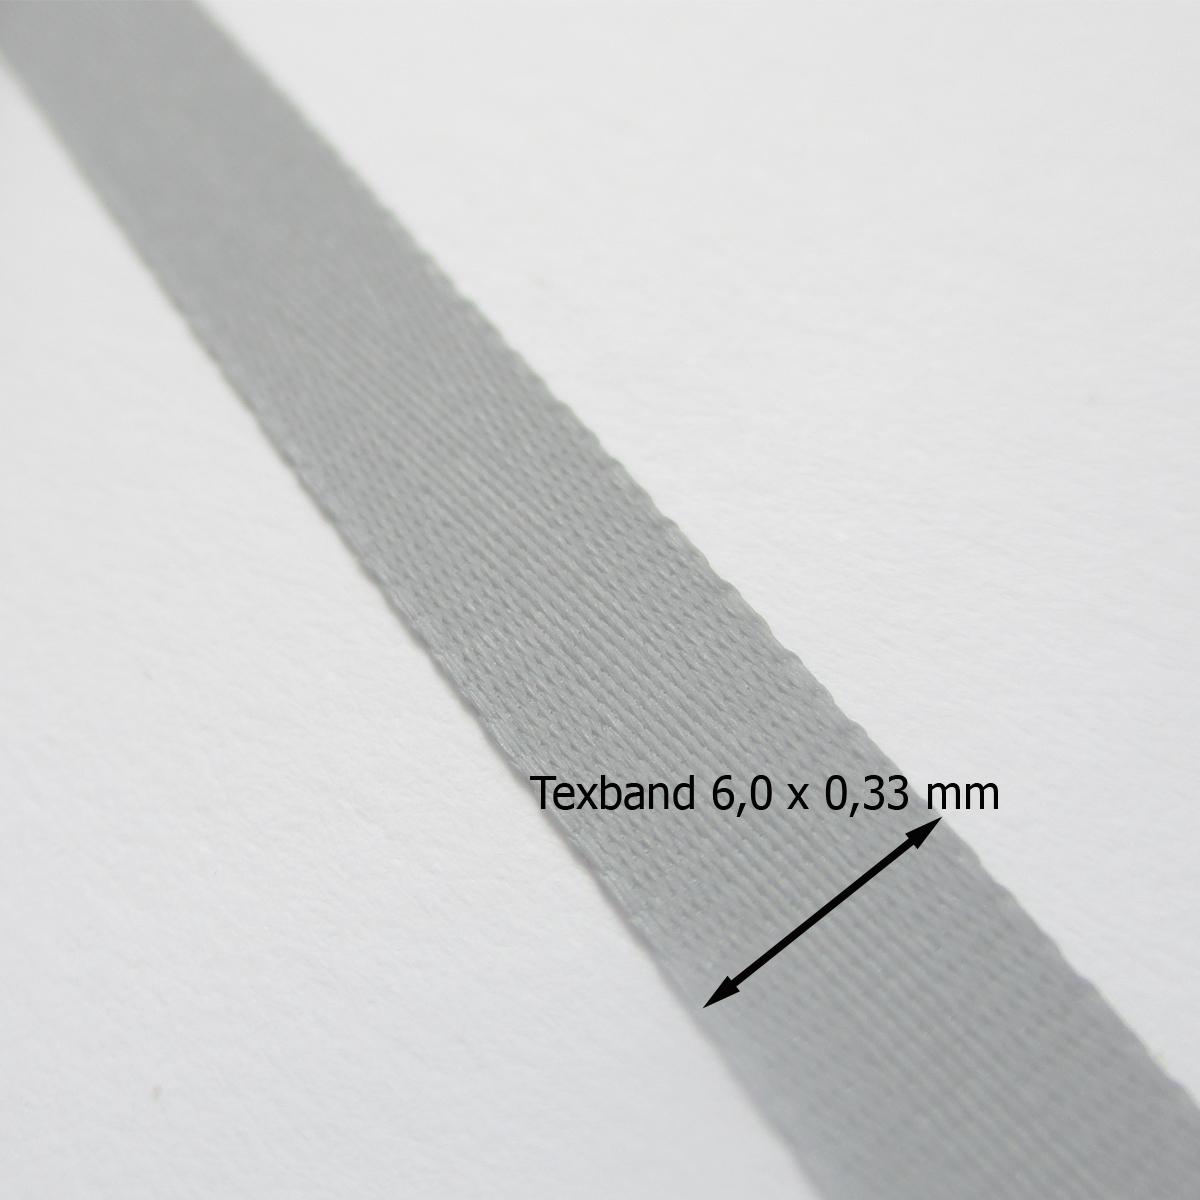 Texband